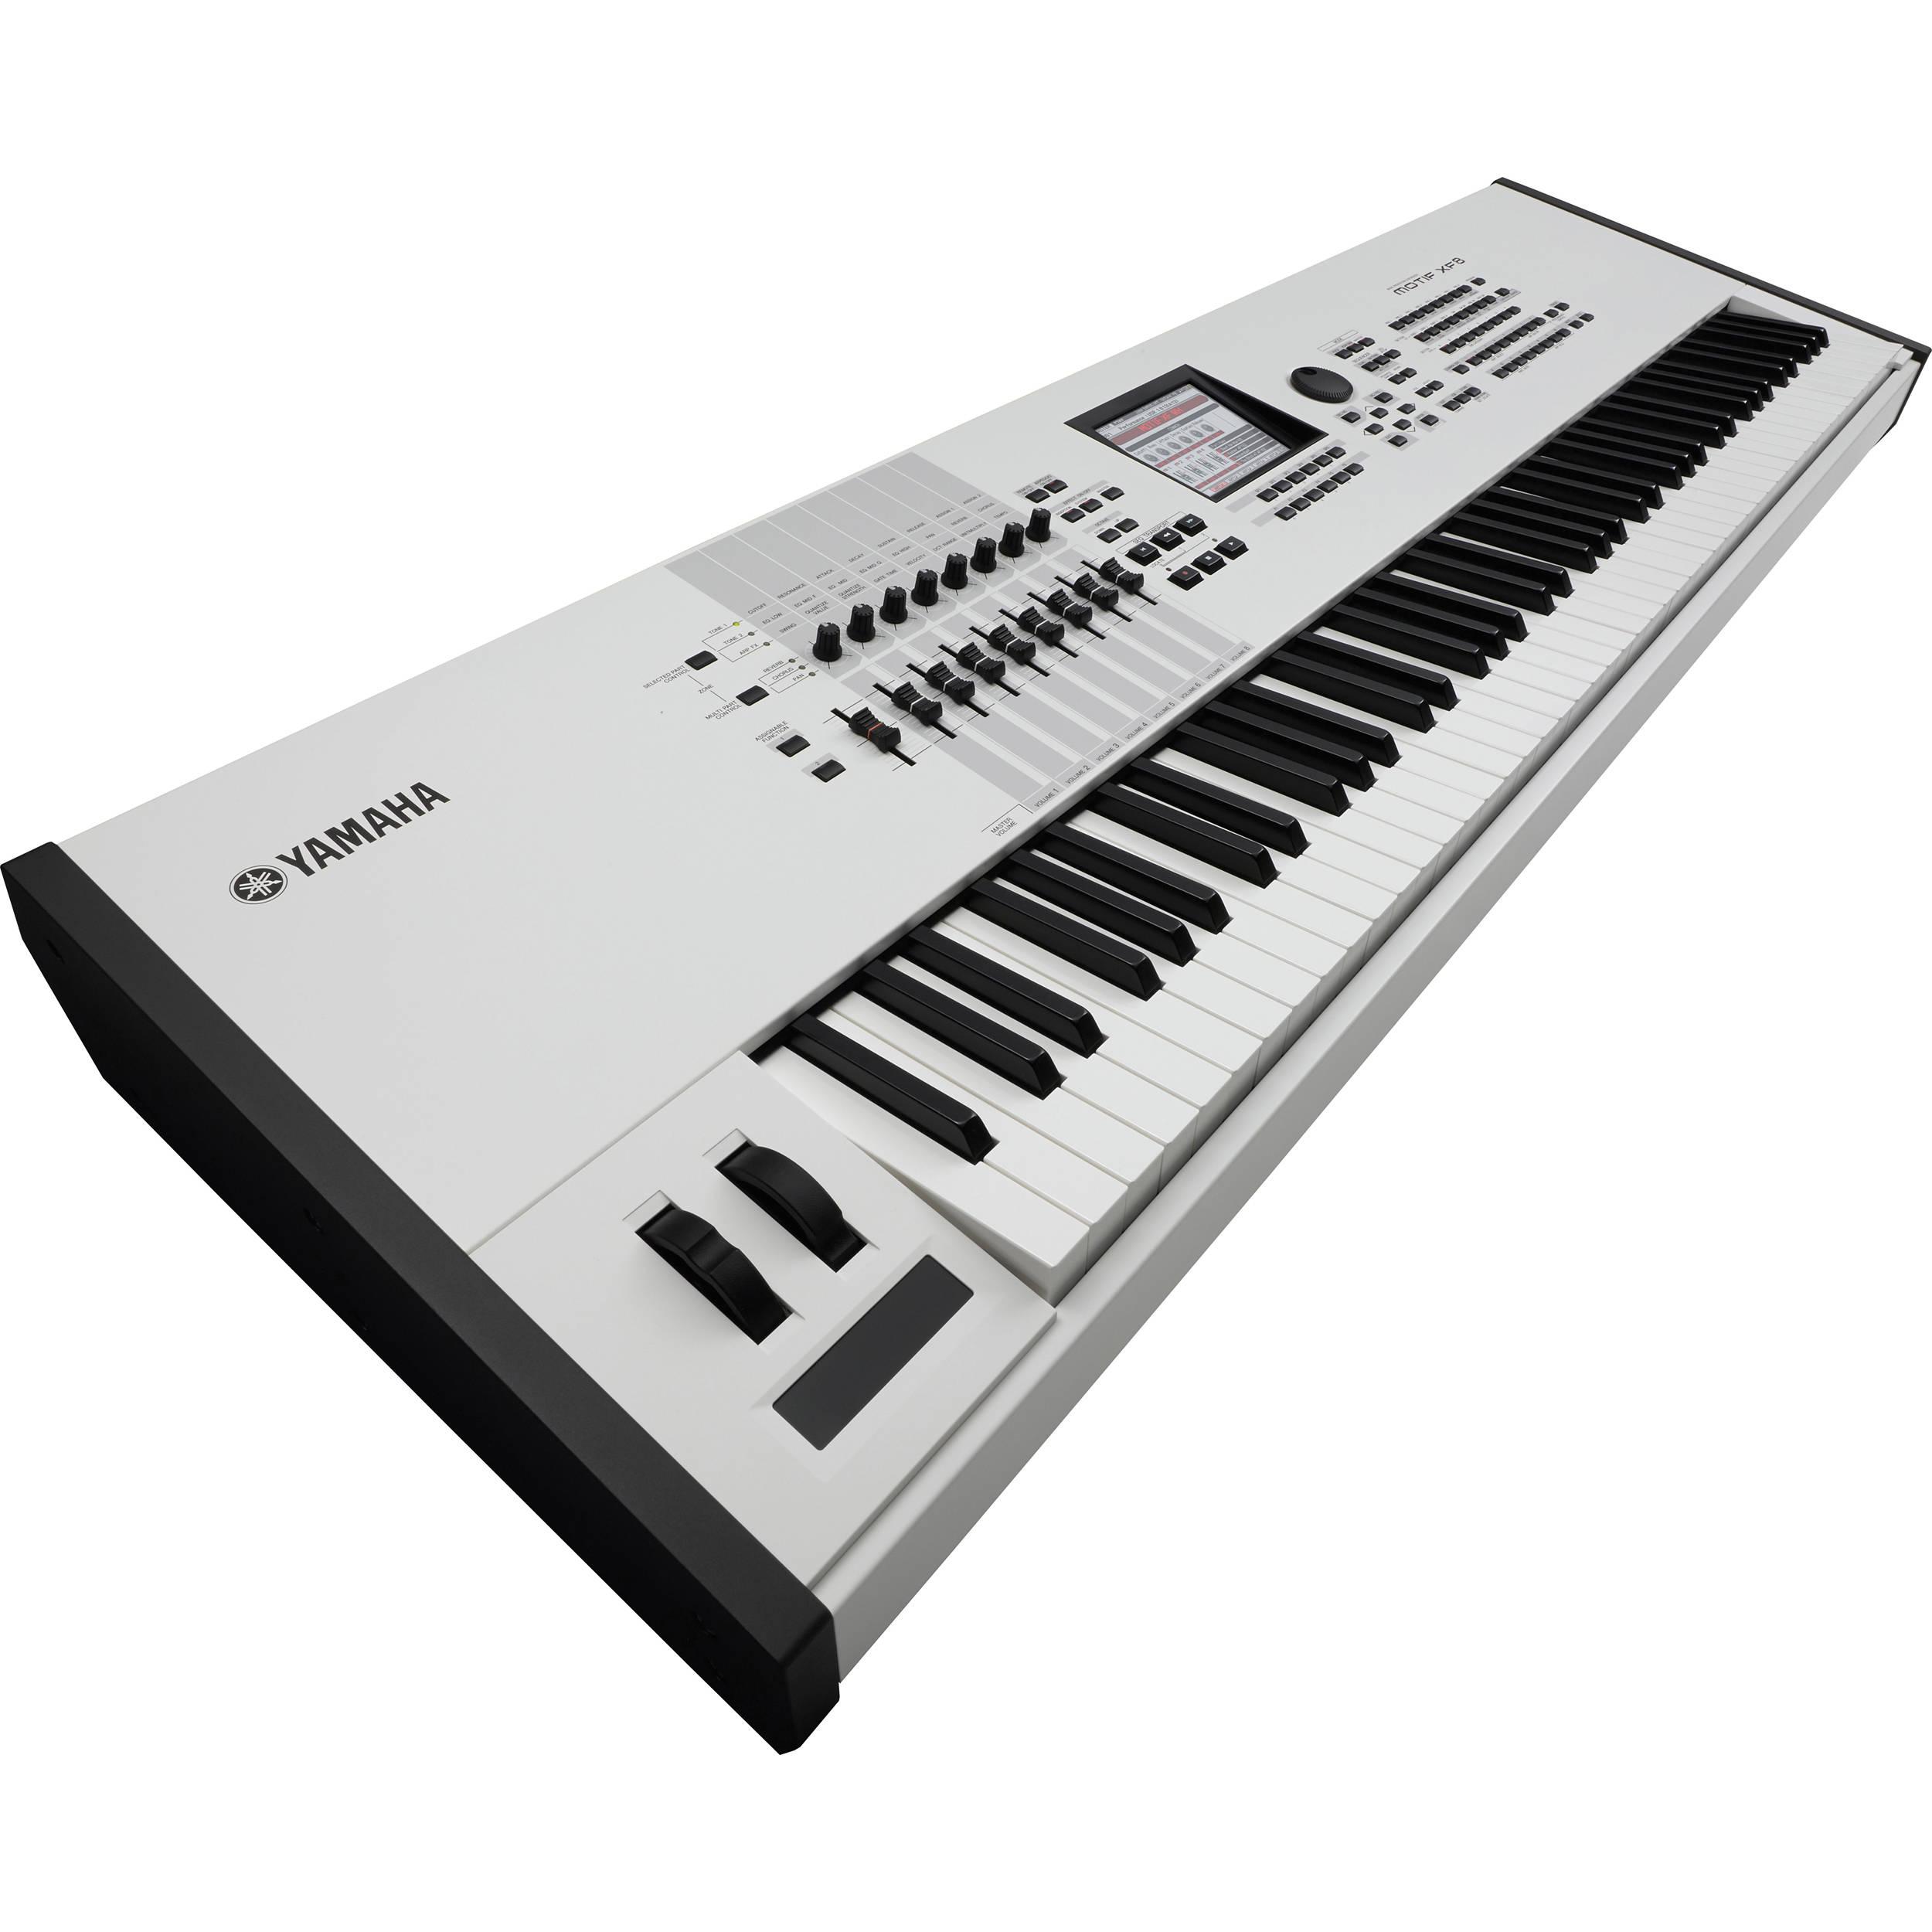 yamaha motif xf8 wh workstation keyboard motifxf8 wh b h